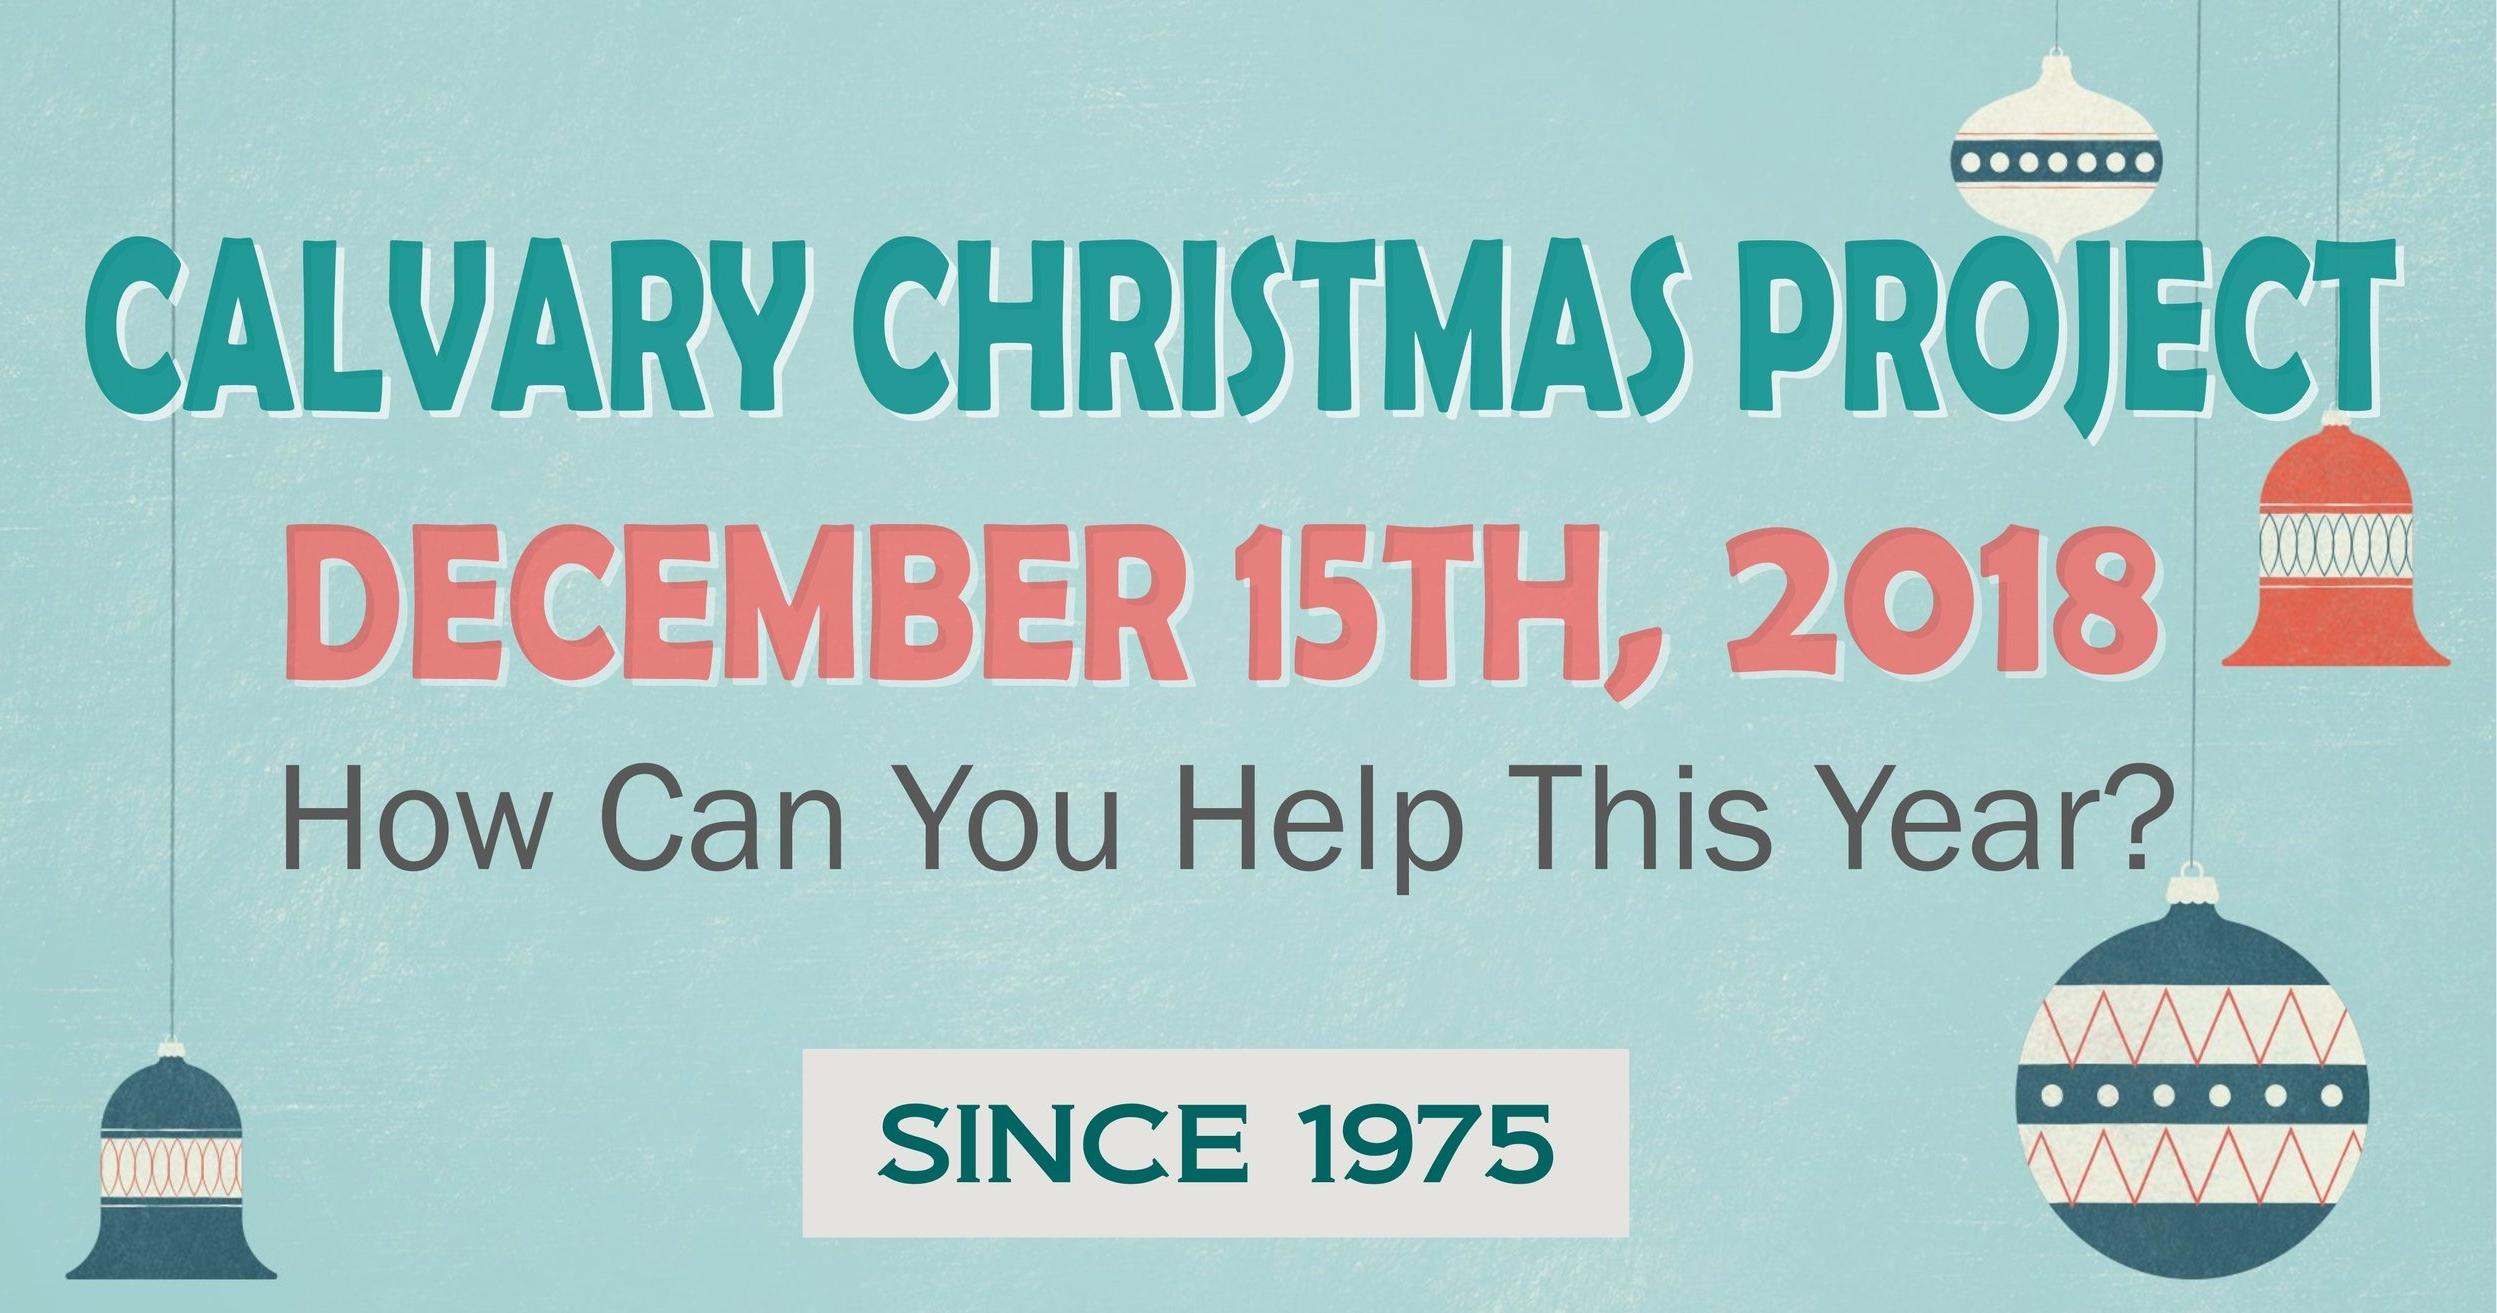 Christmas Project Facebook Link 072618.jpg